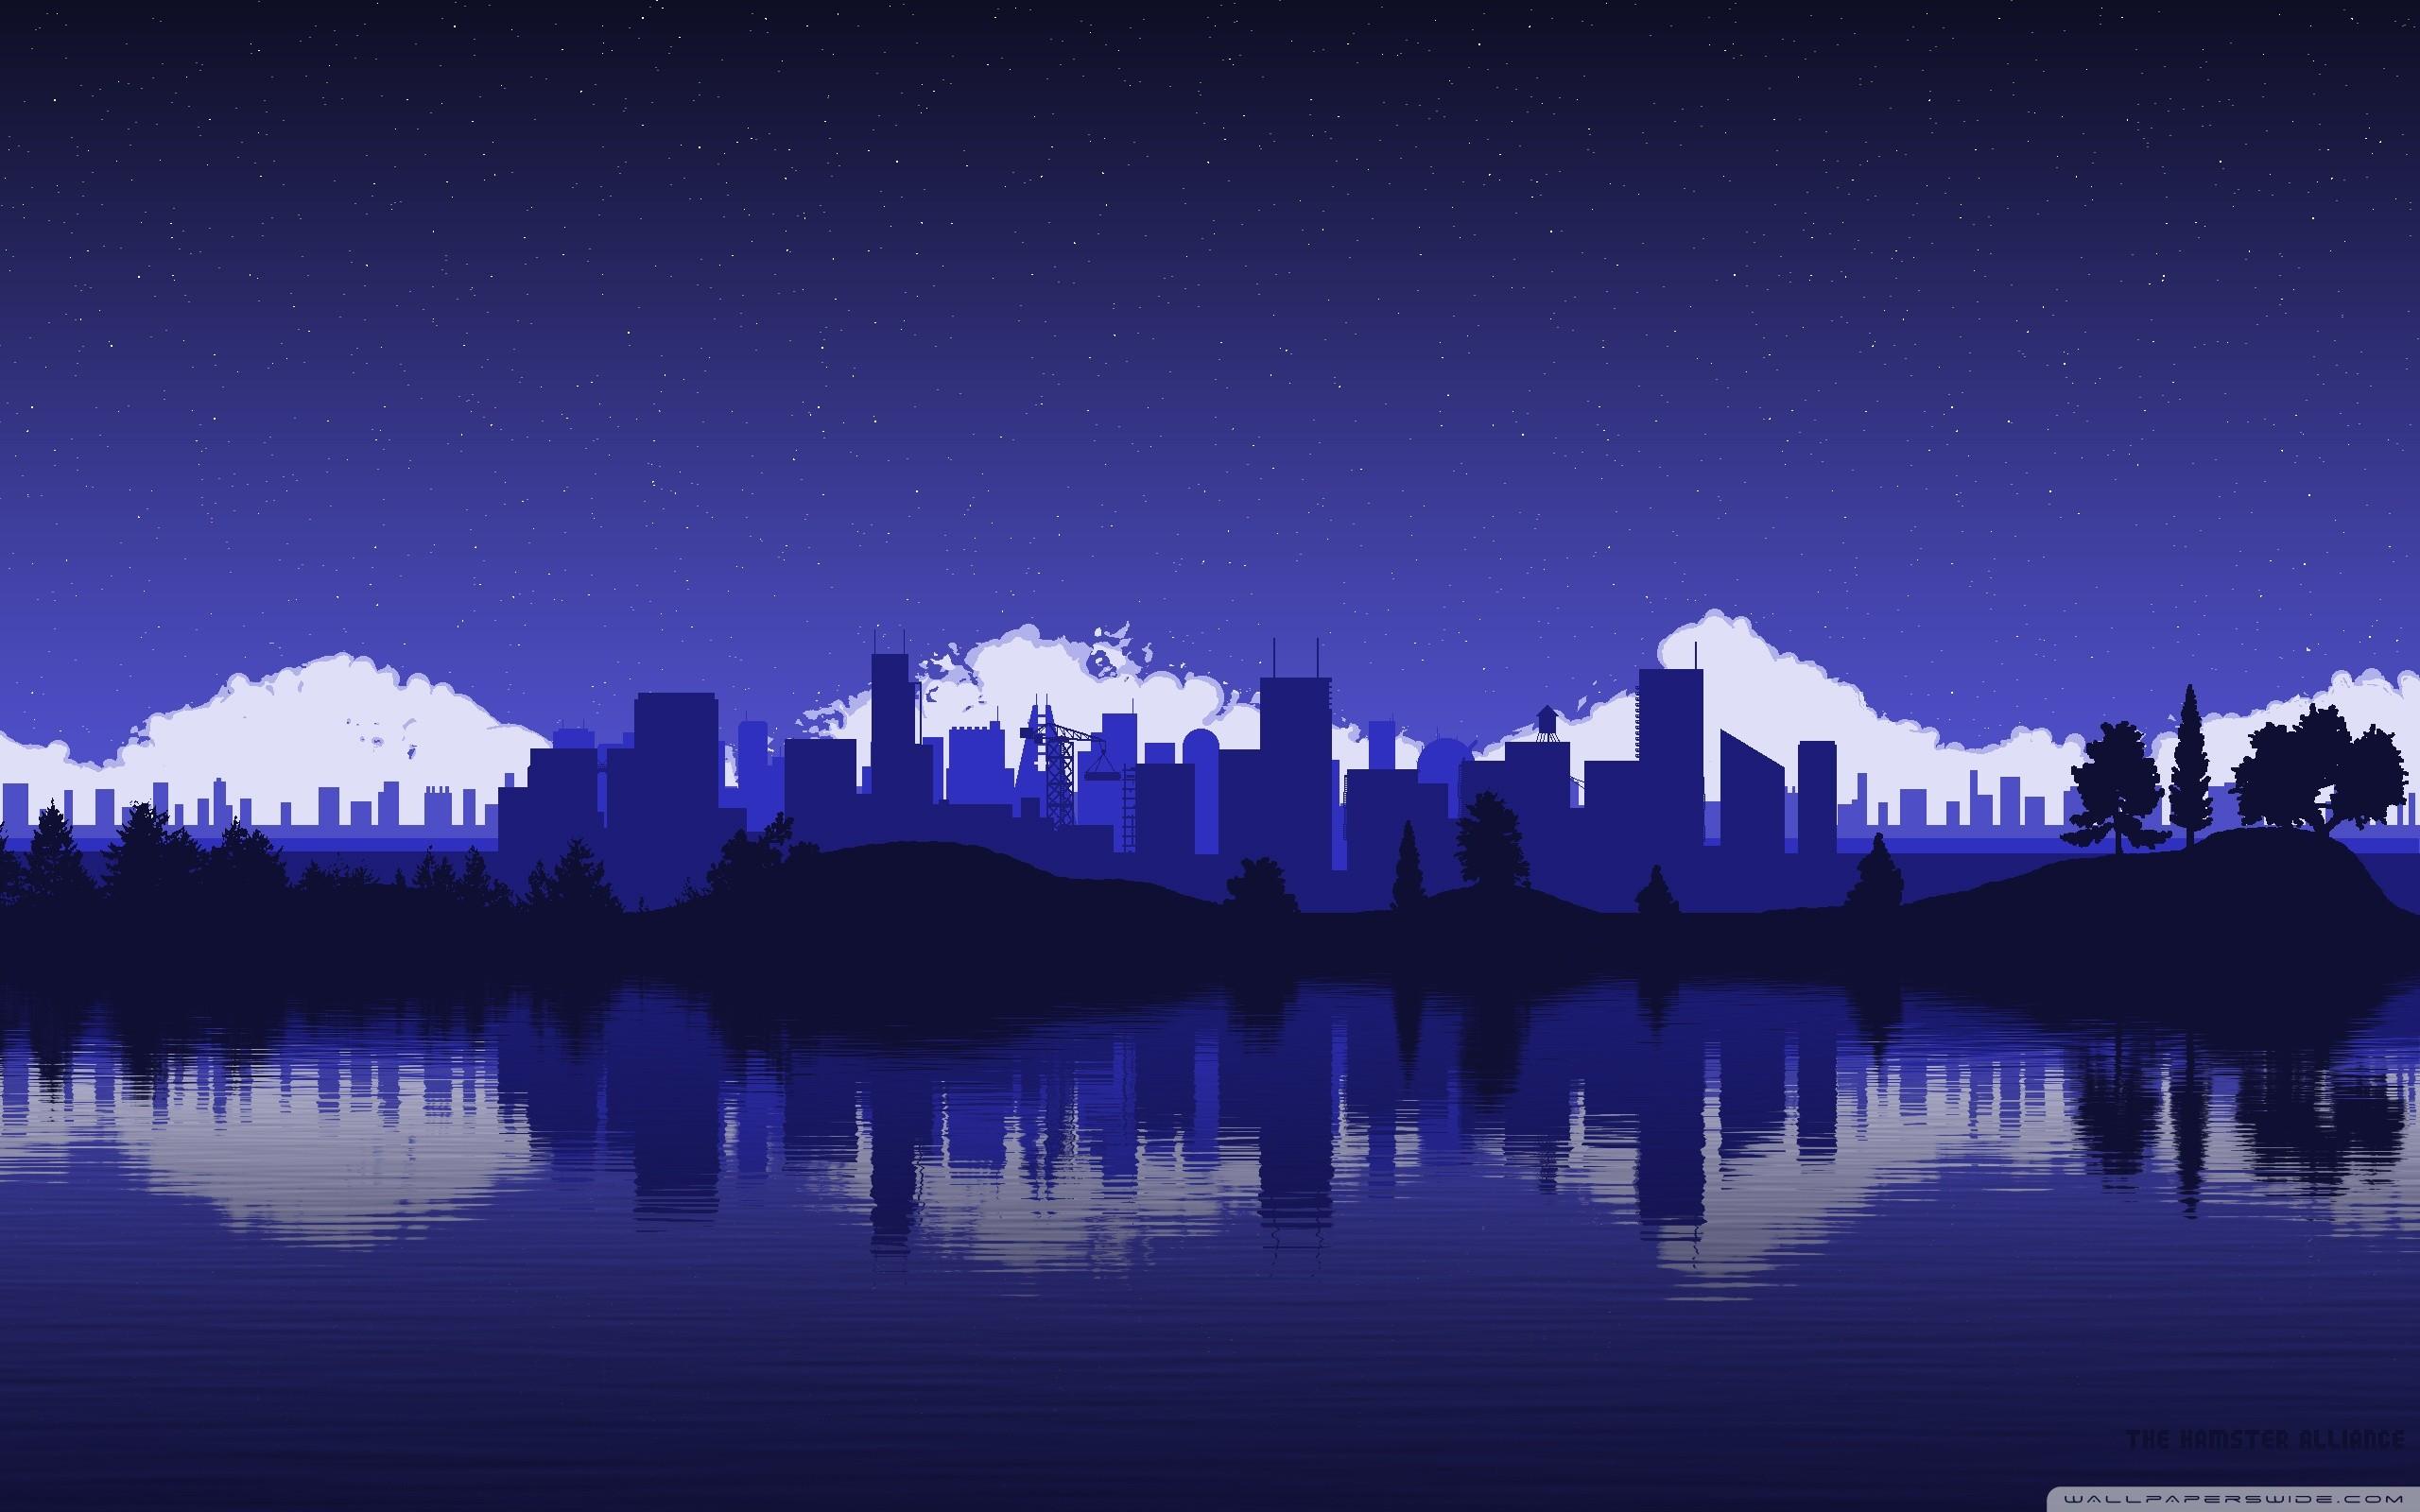 … city skyline silhouette hd desktop wallpaper high definition …